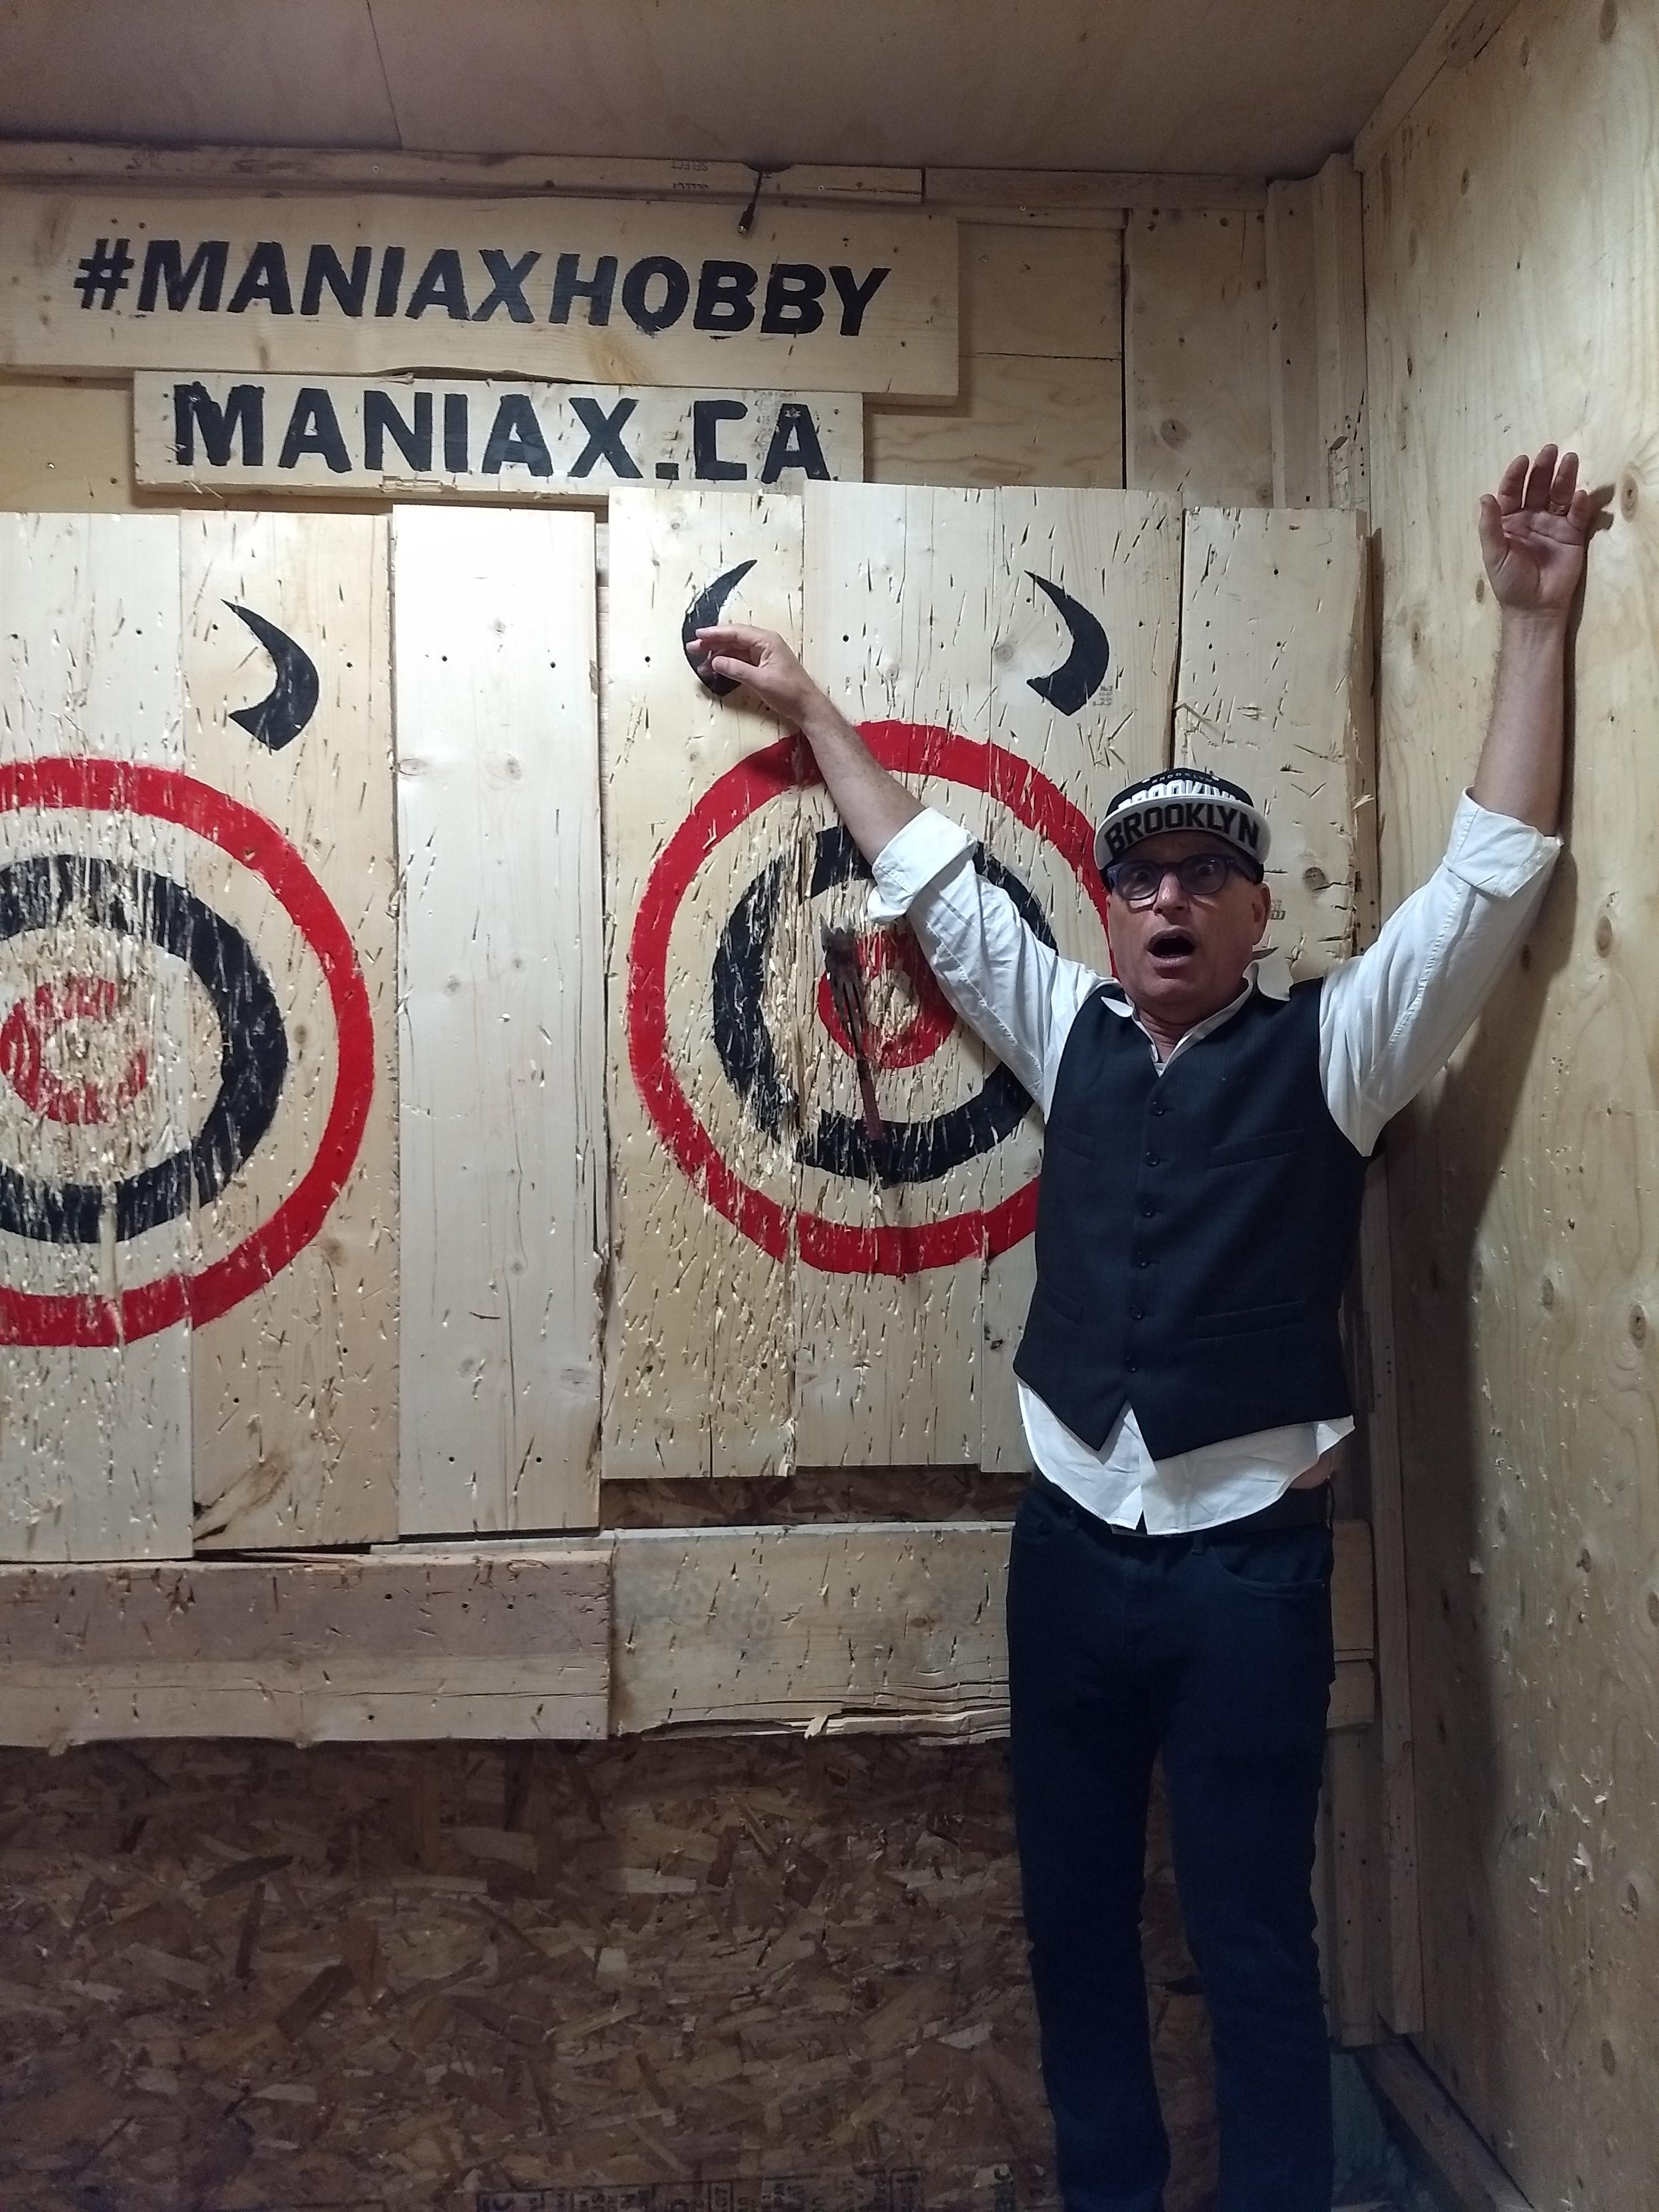 Howie-Mandel-axe=thworing-maniax